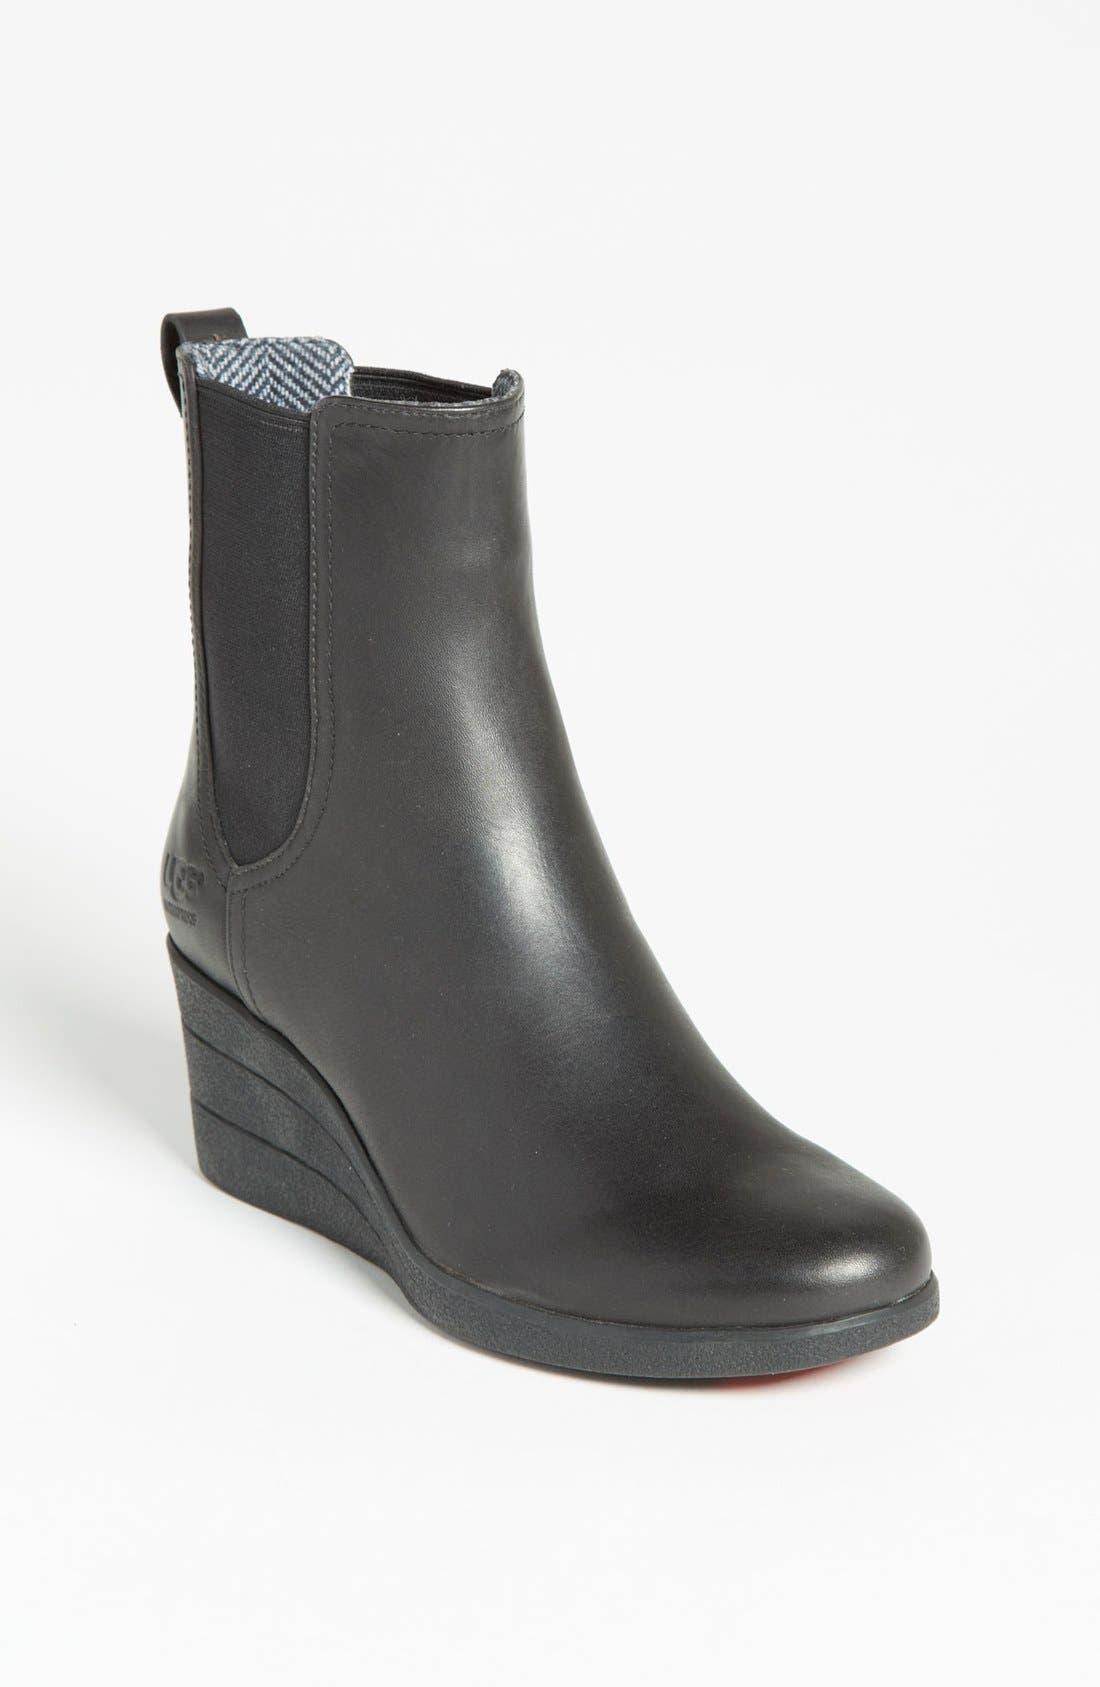 Alternate Image 1 Selected - UGG® Australia 'UGGpure™ - Dupre' Rain Boot (Women)